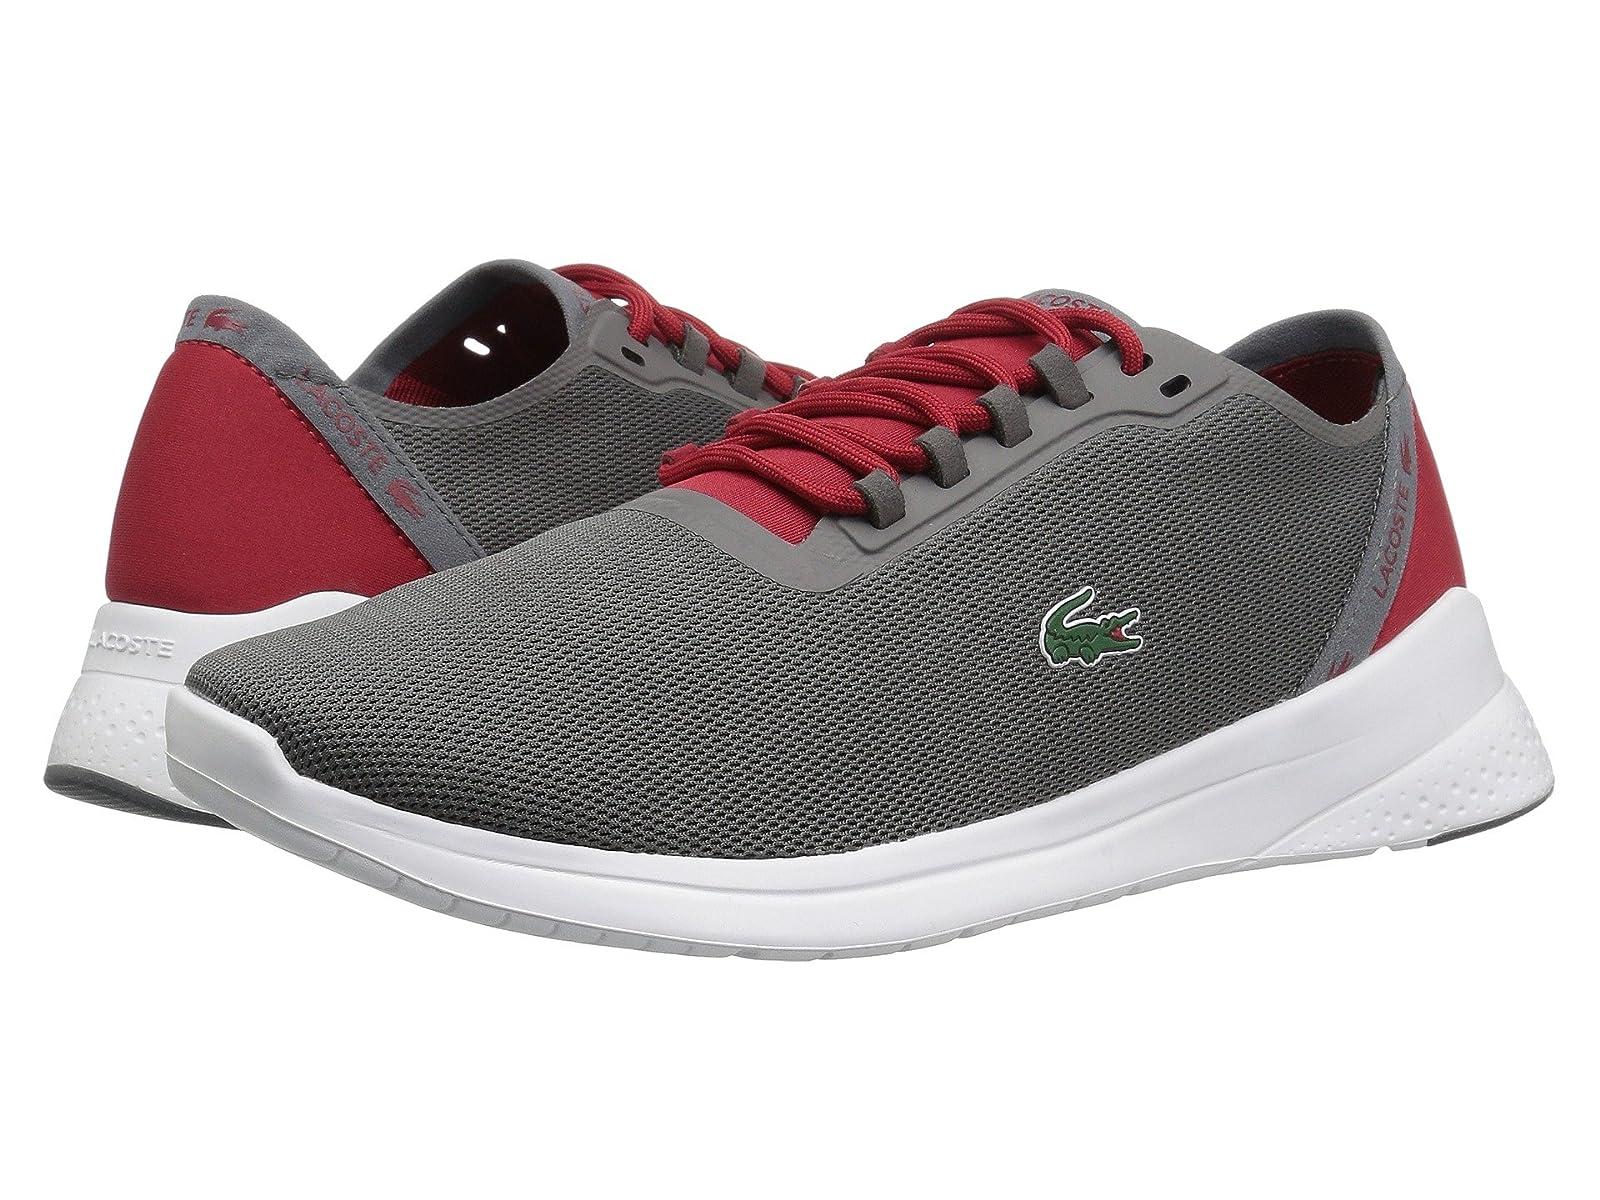 Lacoste LT Fit 118 4Atmospheric grades have affordable shoes